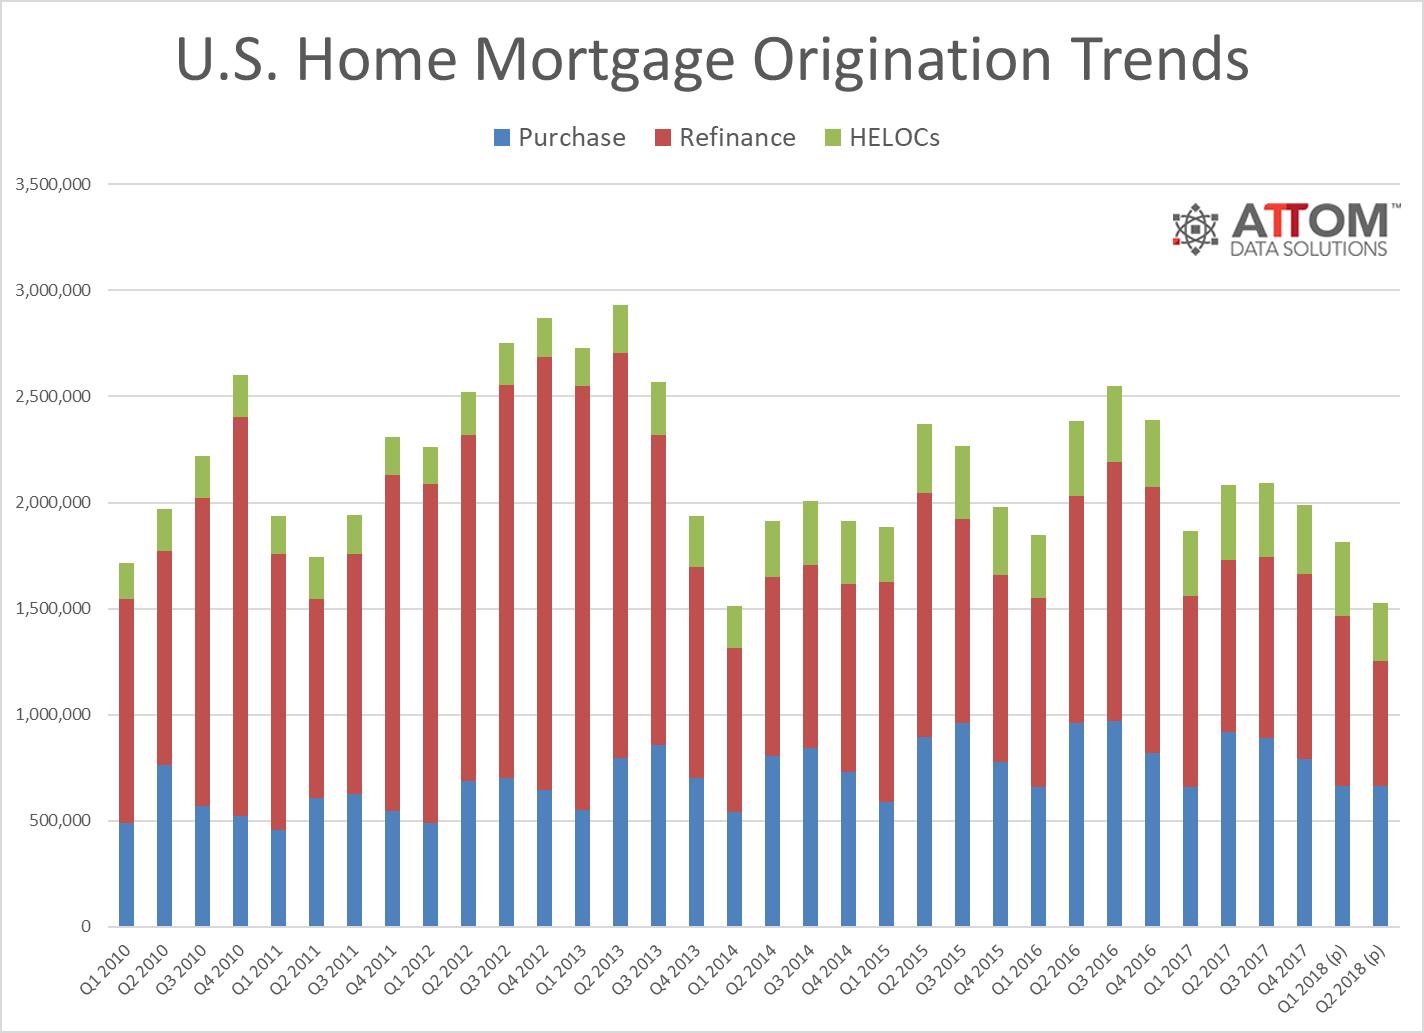 mortgage_origination_trends_Q2_2018.png